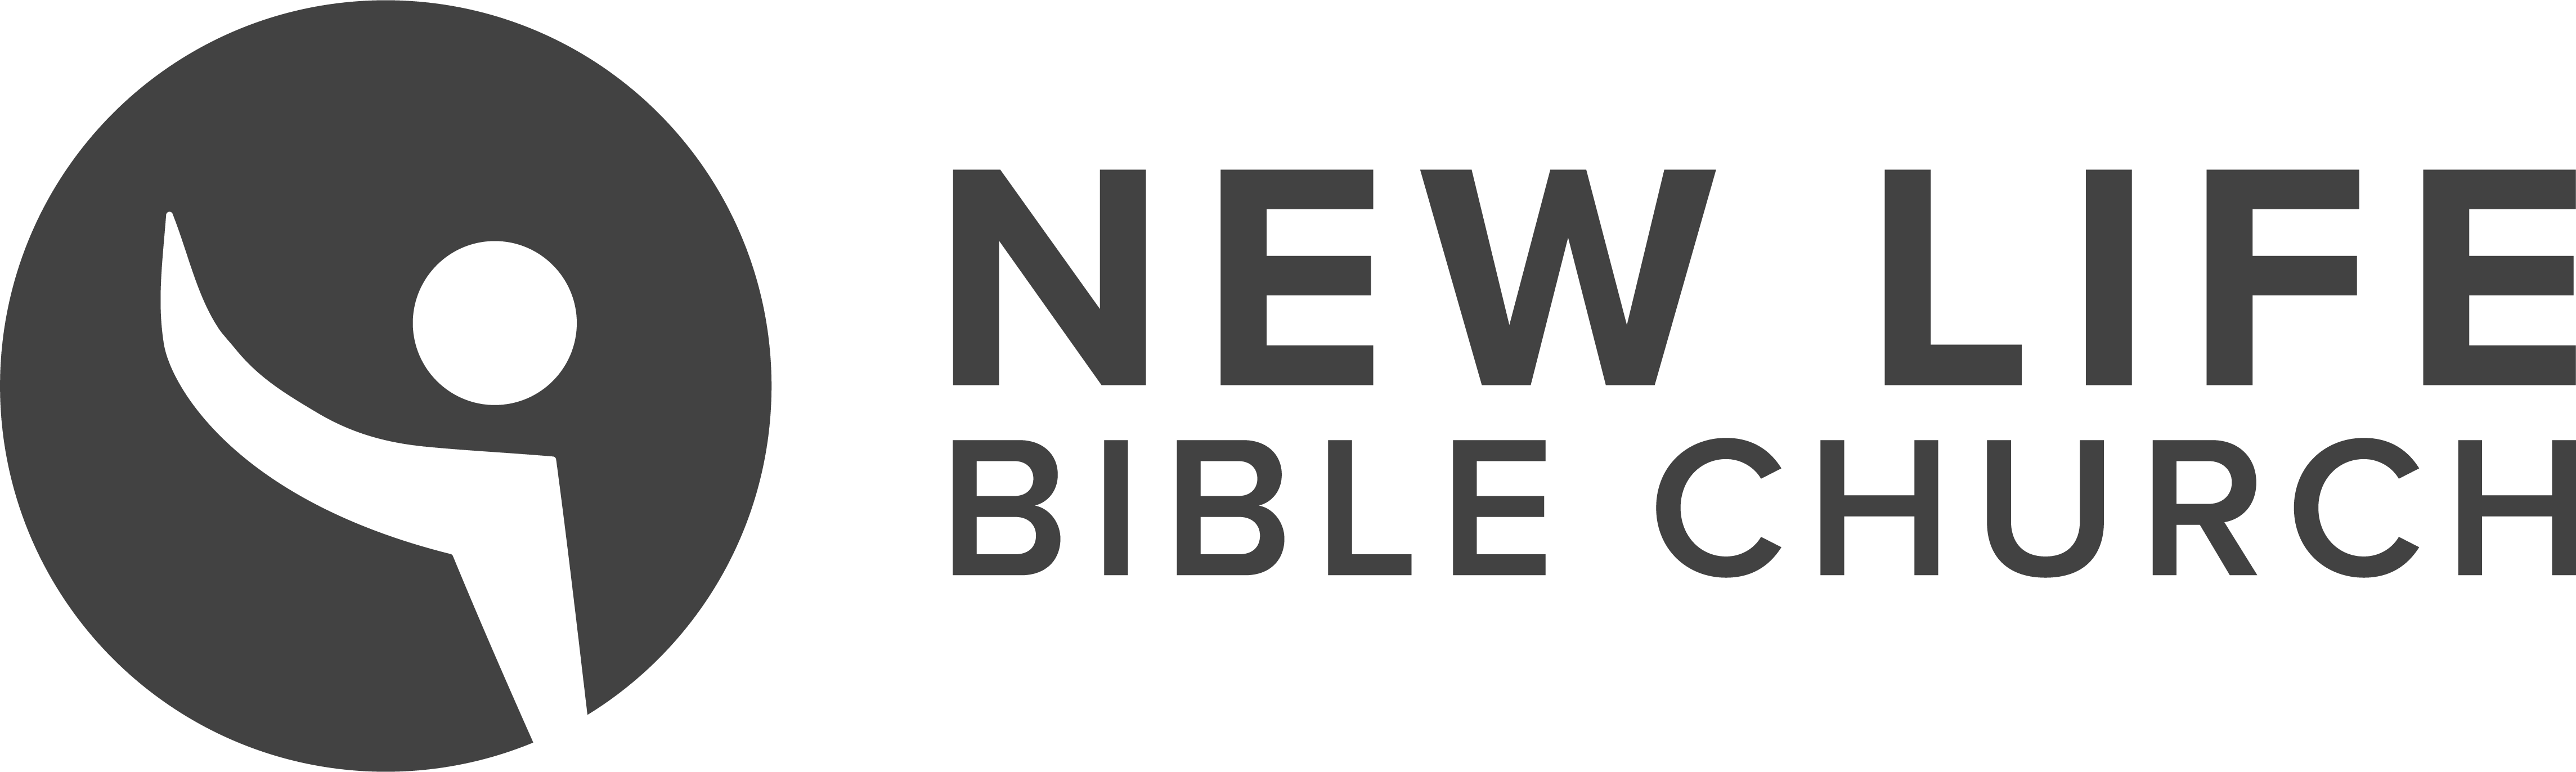 New Life Bible Church of Winnebago, IL